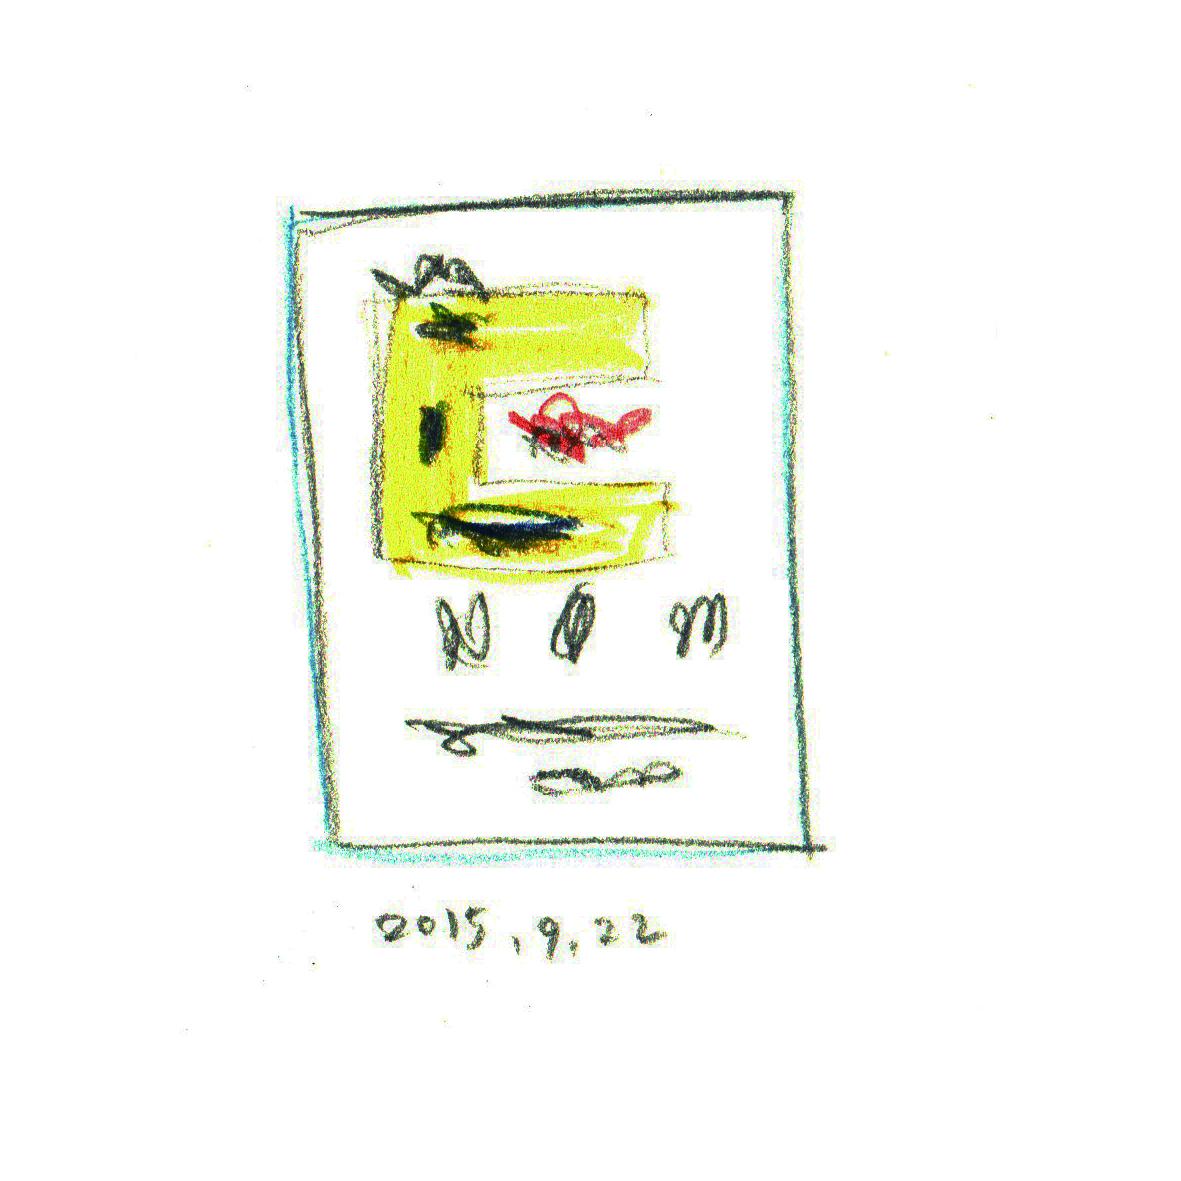 2015/09/22